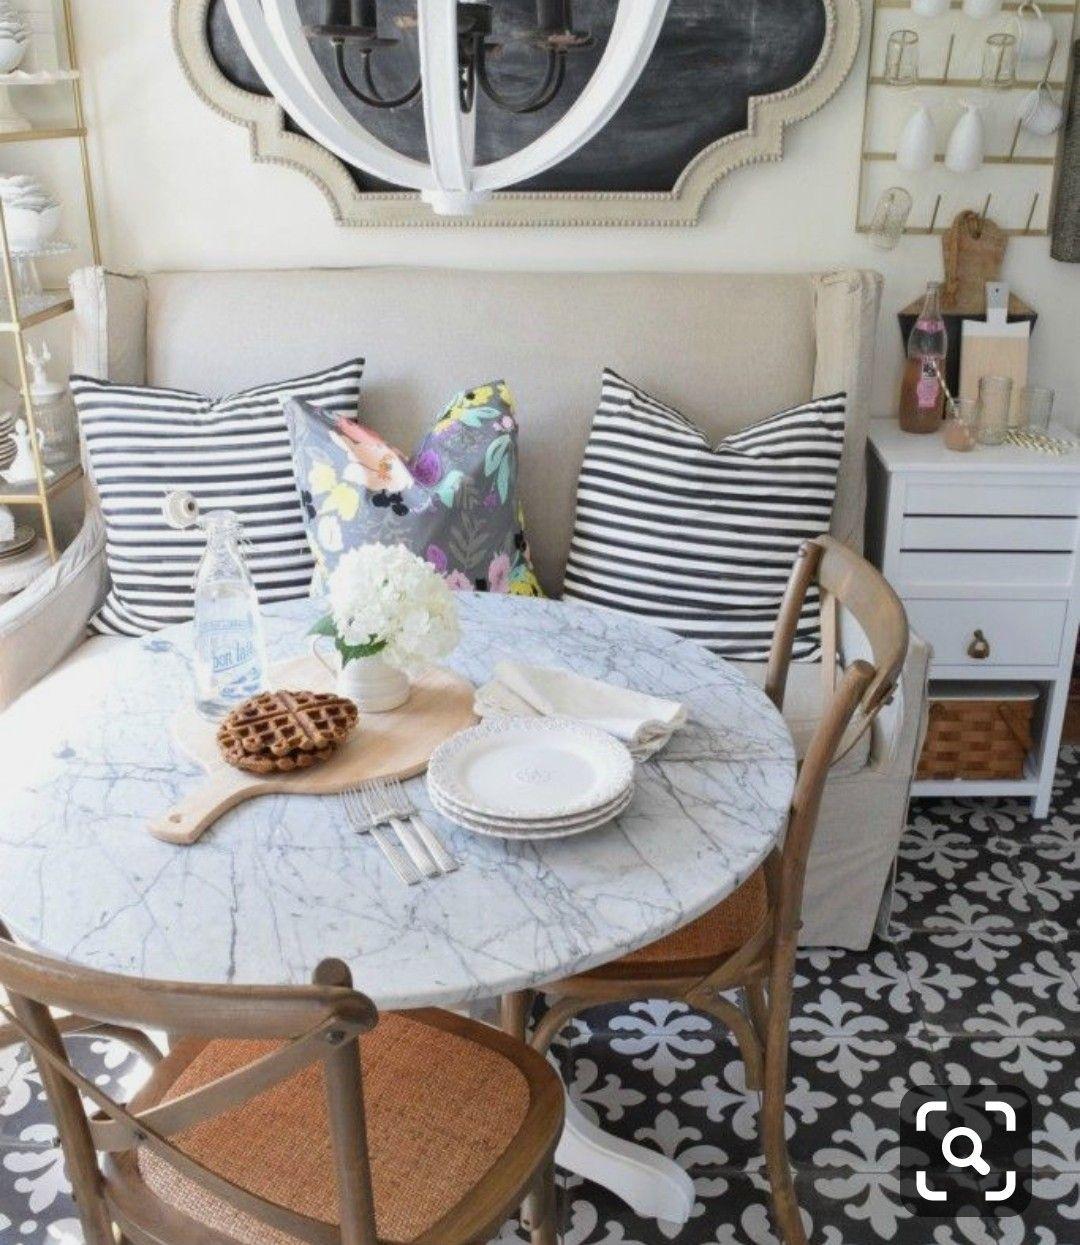 Dining Room Corner Decorating Ideas Space Saving Solutions: Idea By Jennifer Lambert On Kitchen